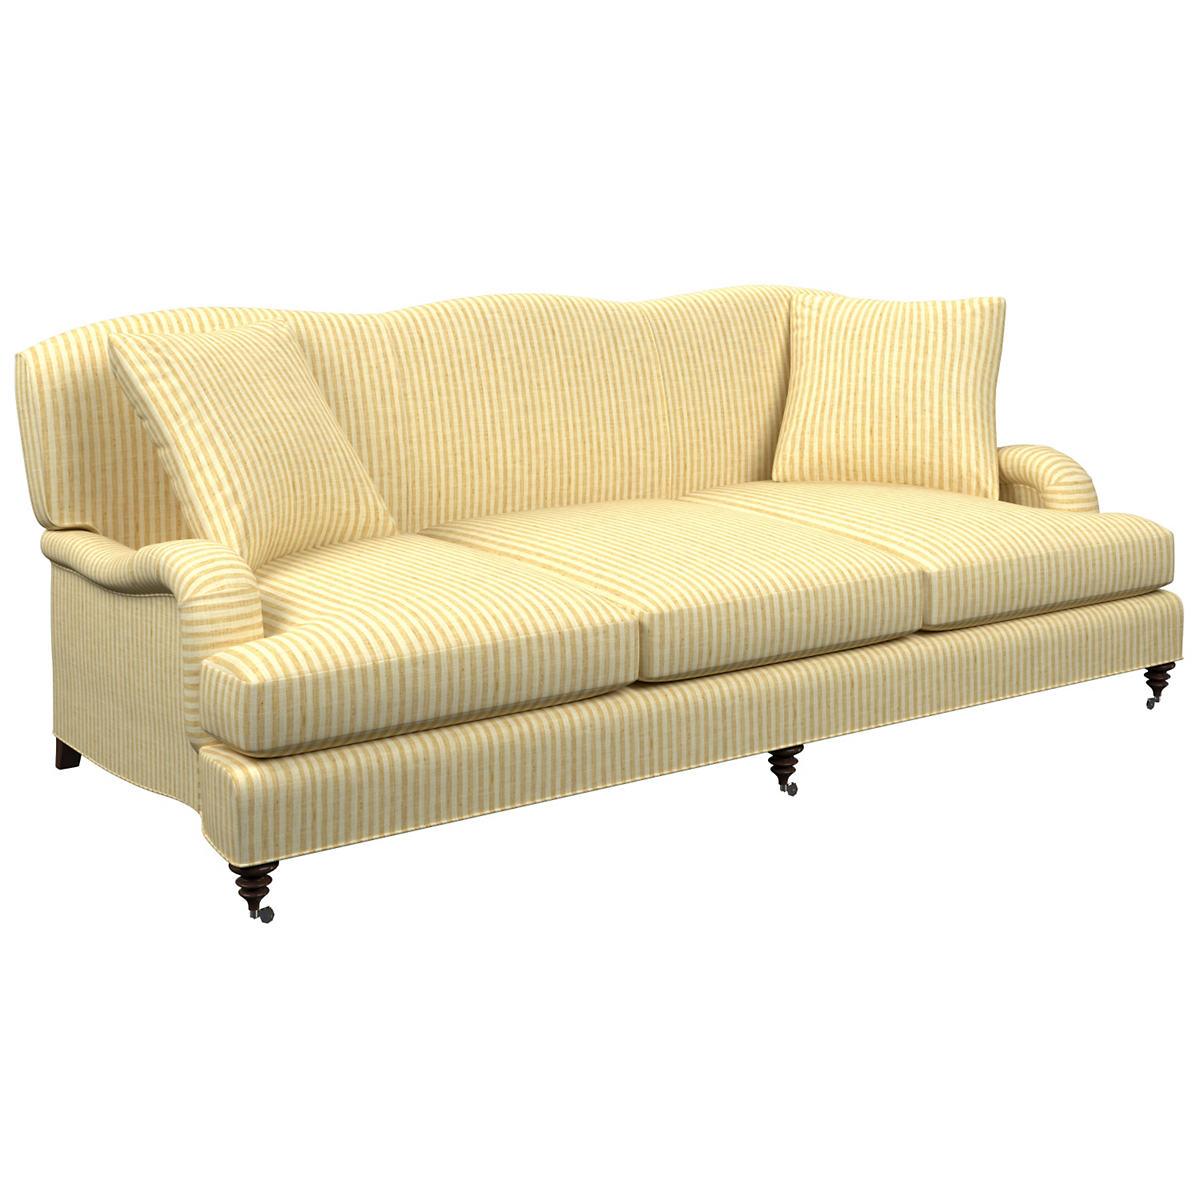 Adams Ticking Gold Litchfield 3 Seater Sofa